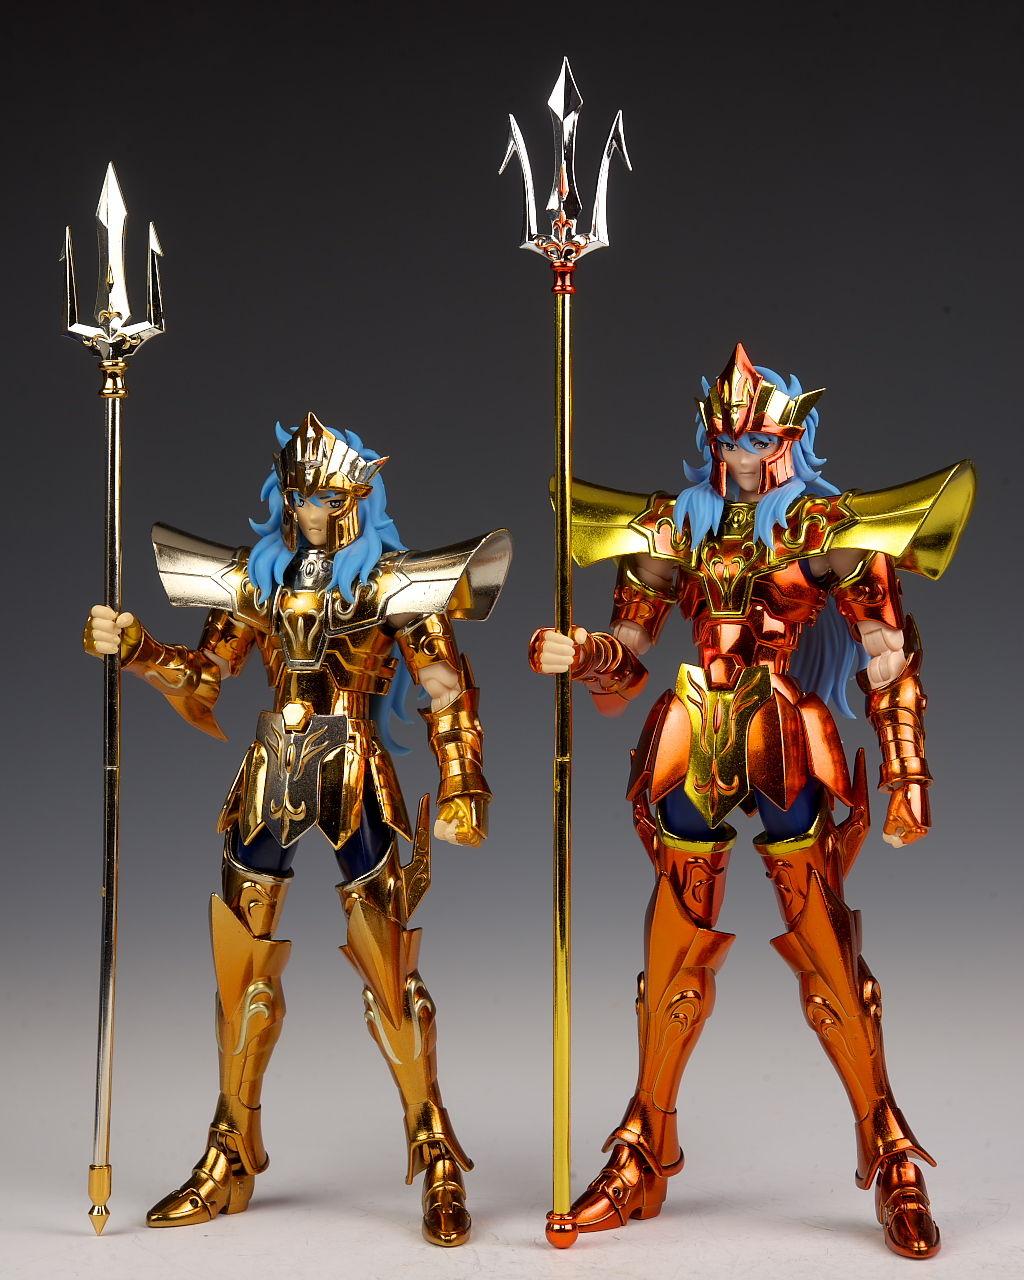 [Imagens] Poseidon EX & Poseidon EX Imperial Throne Set IrRbnMQM_o